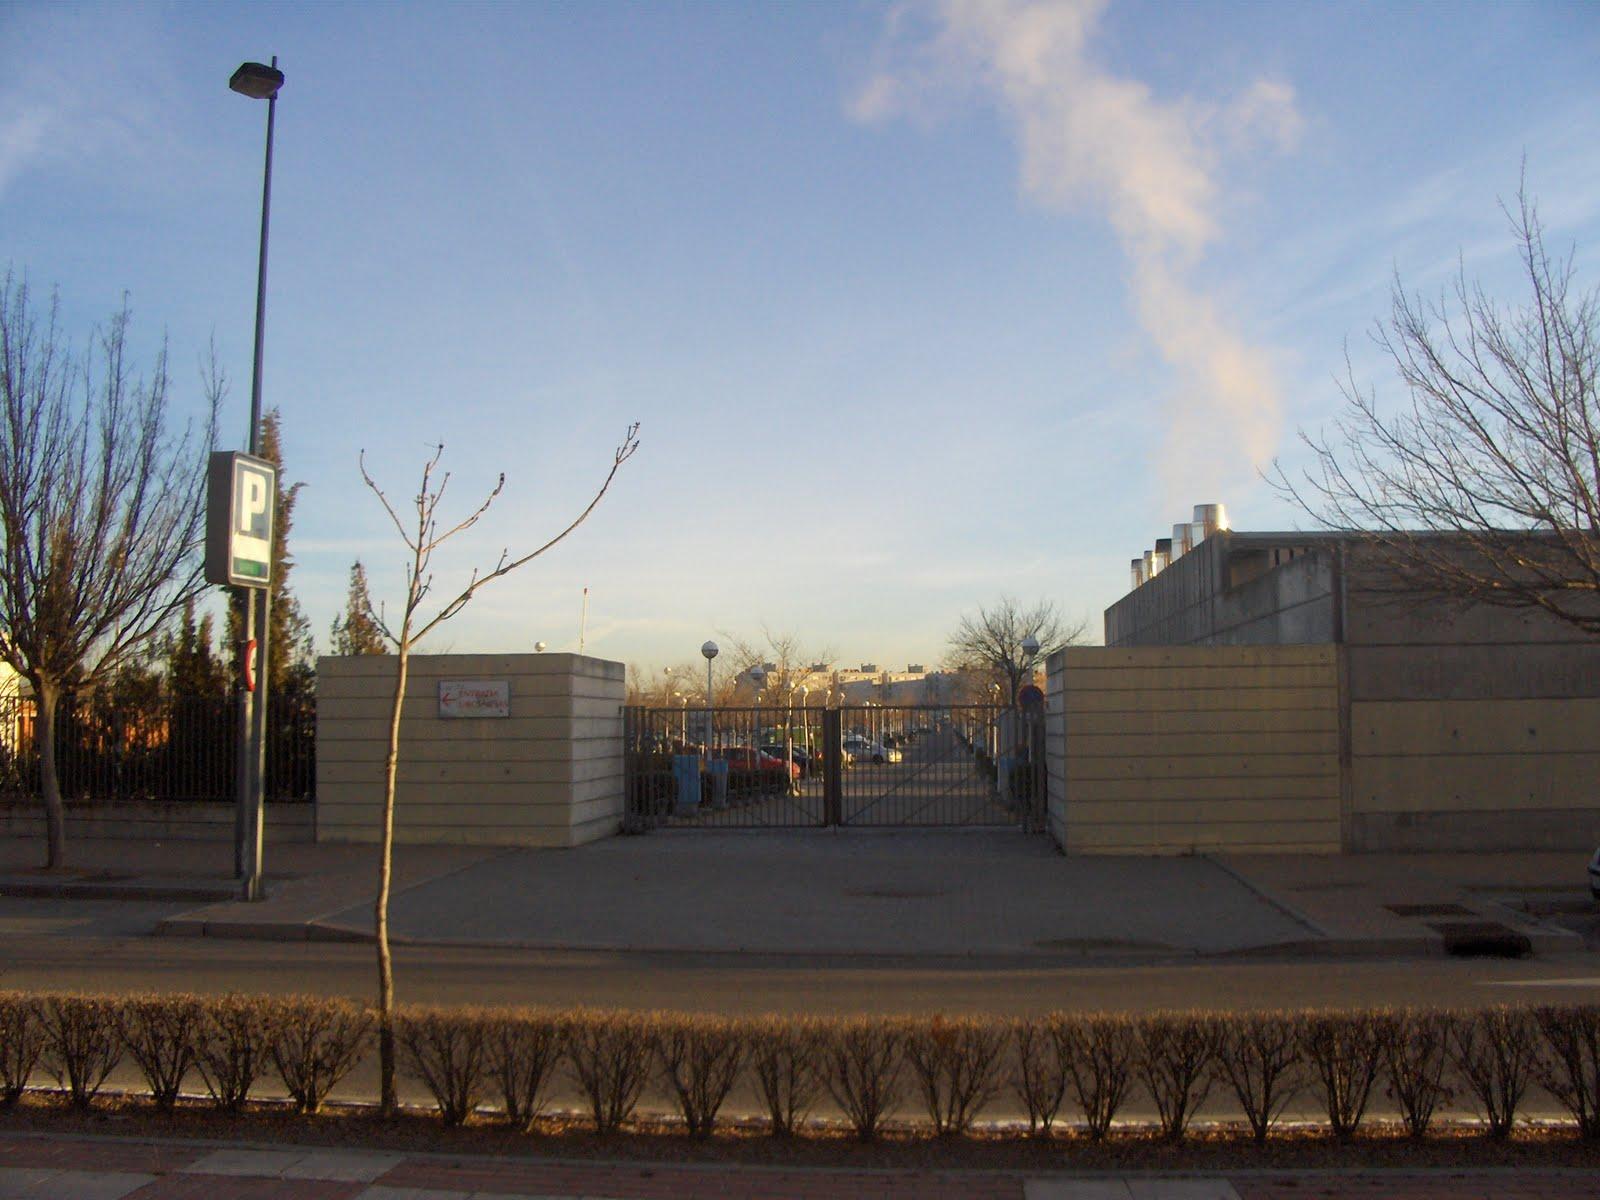 Avv parque oeste alcorc n apertura acceso hospital de - Parque oeste alcorcon ...